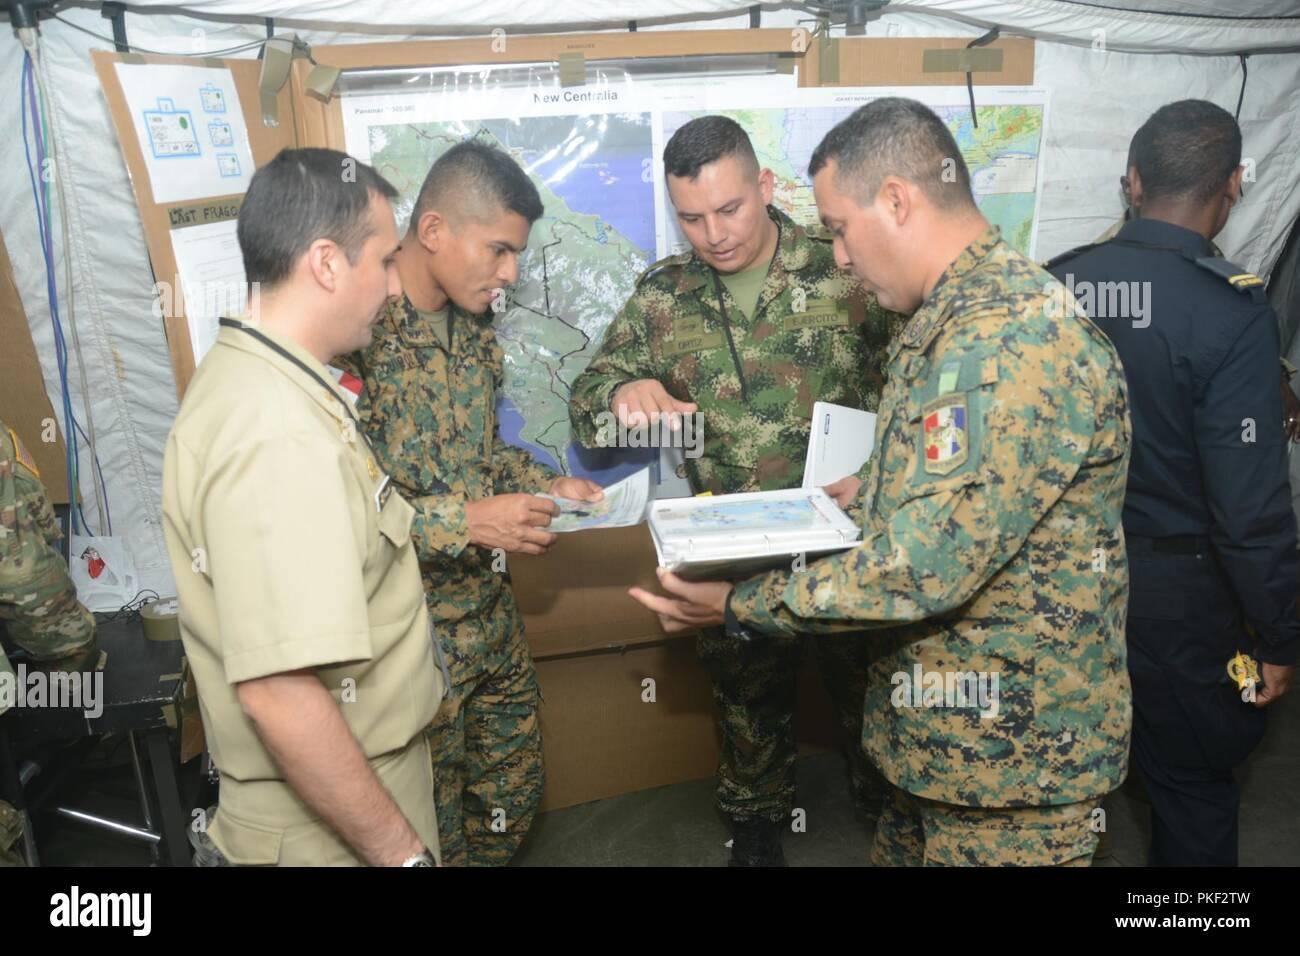 Jbsa Ft Sam Houston Tx Aug 3 2018 Military Service